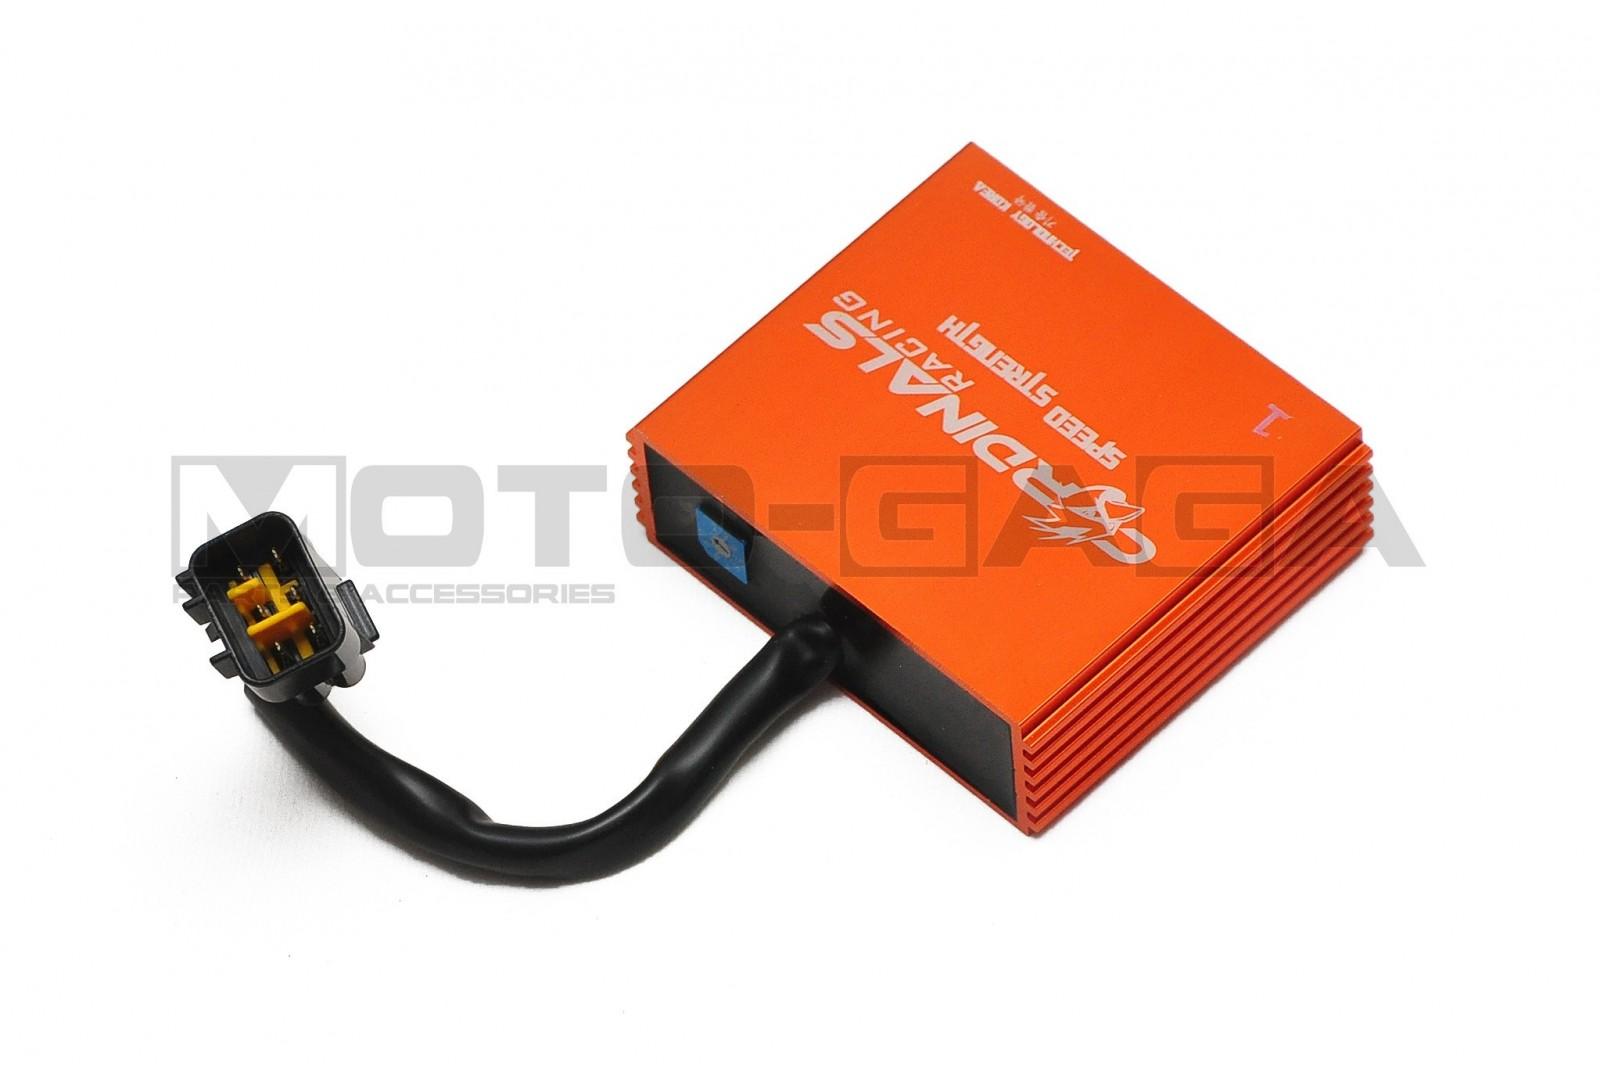 hight resolution of cardinals racing adjustable performance cdi suzuki raider 150r 6 wire